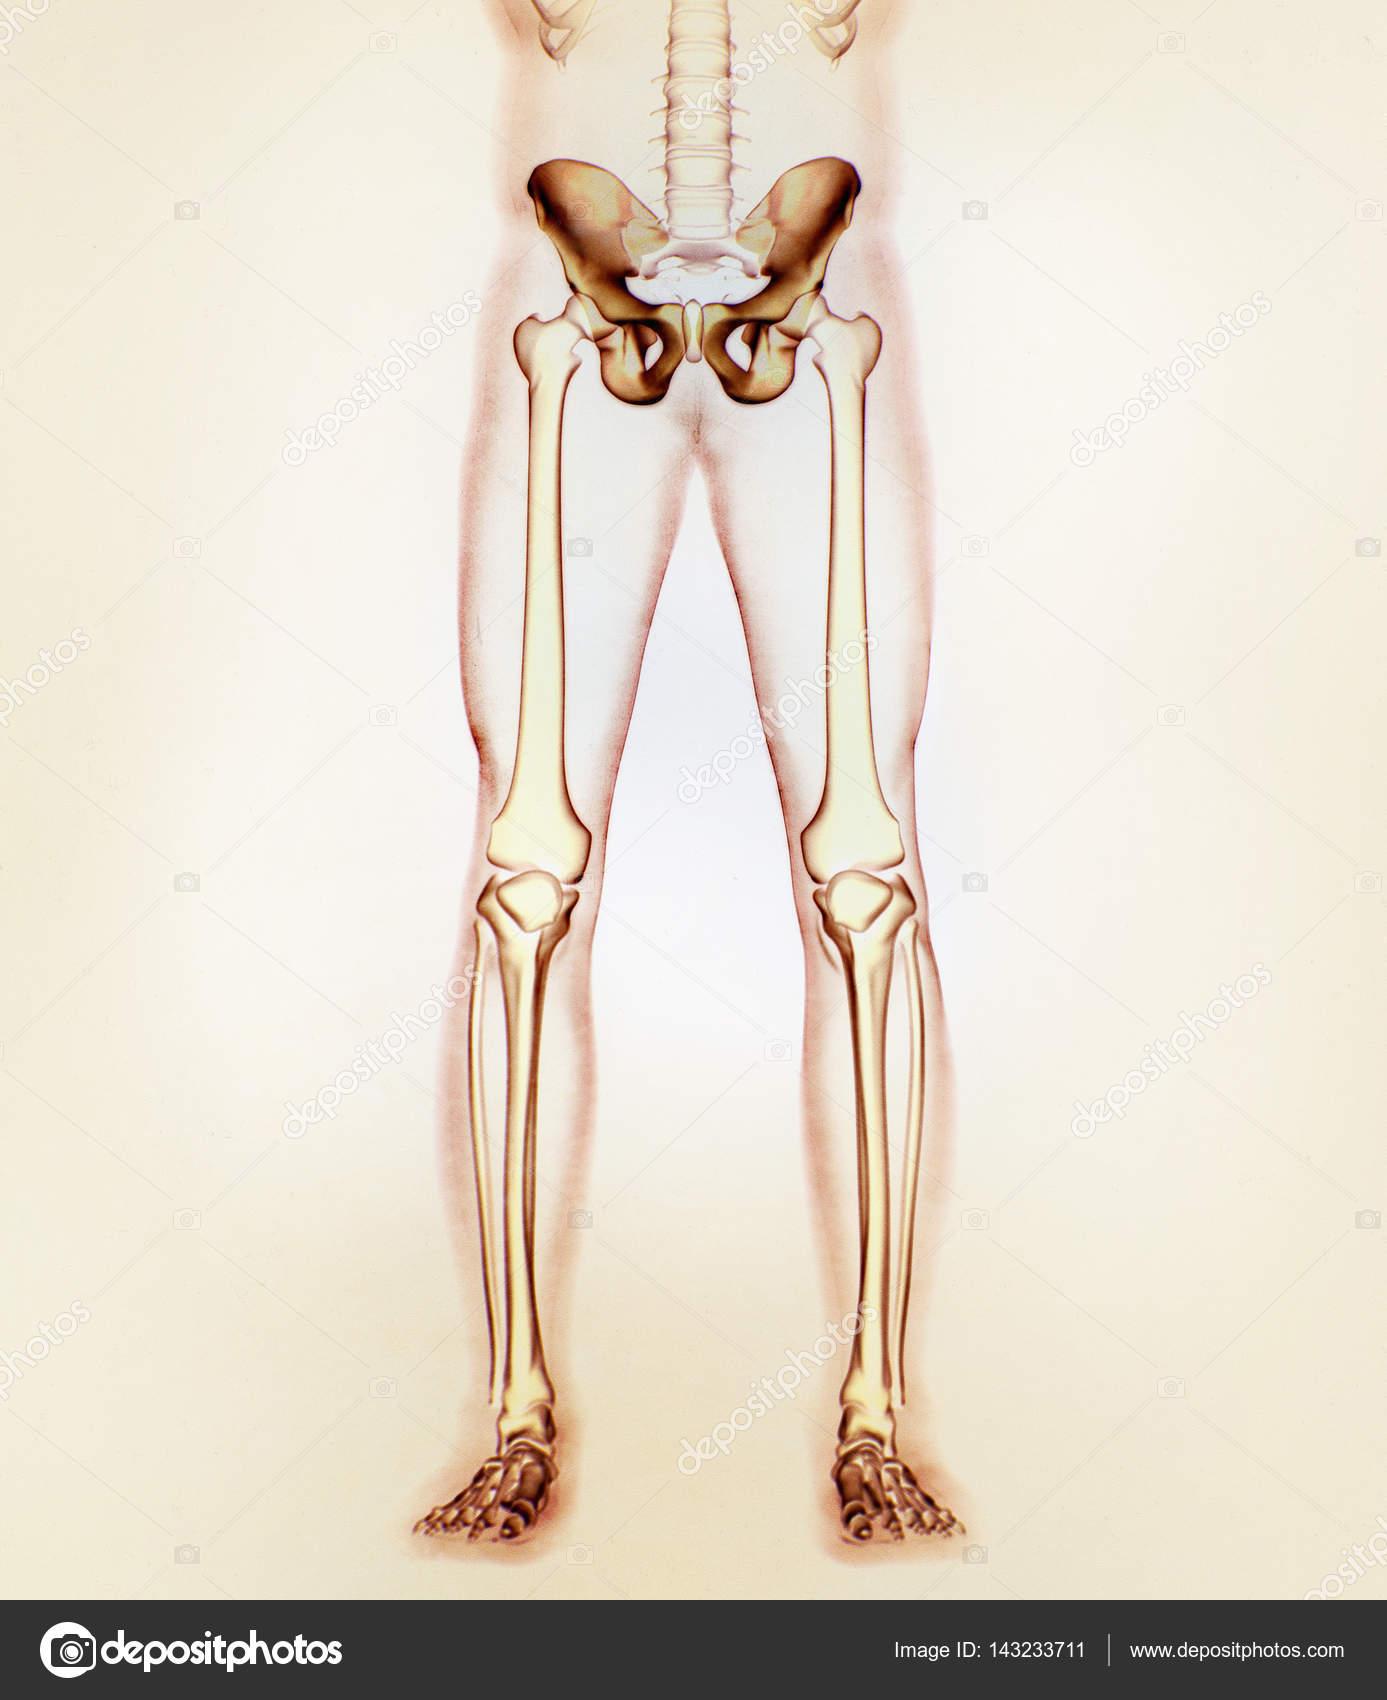 ilium anatomy model — Stock Photo © AnatomyInsider #143233711